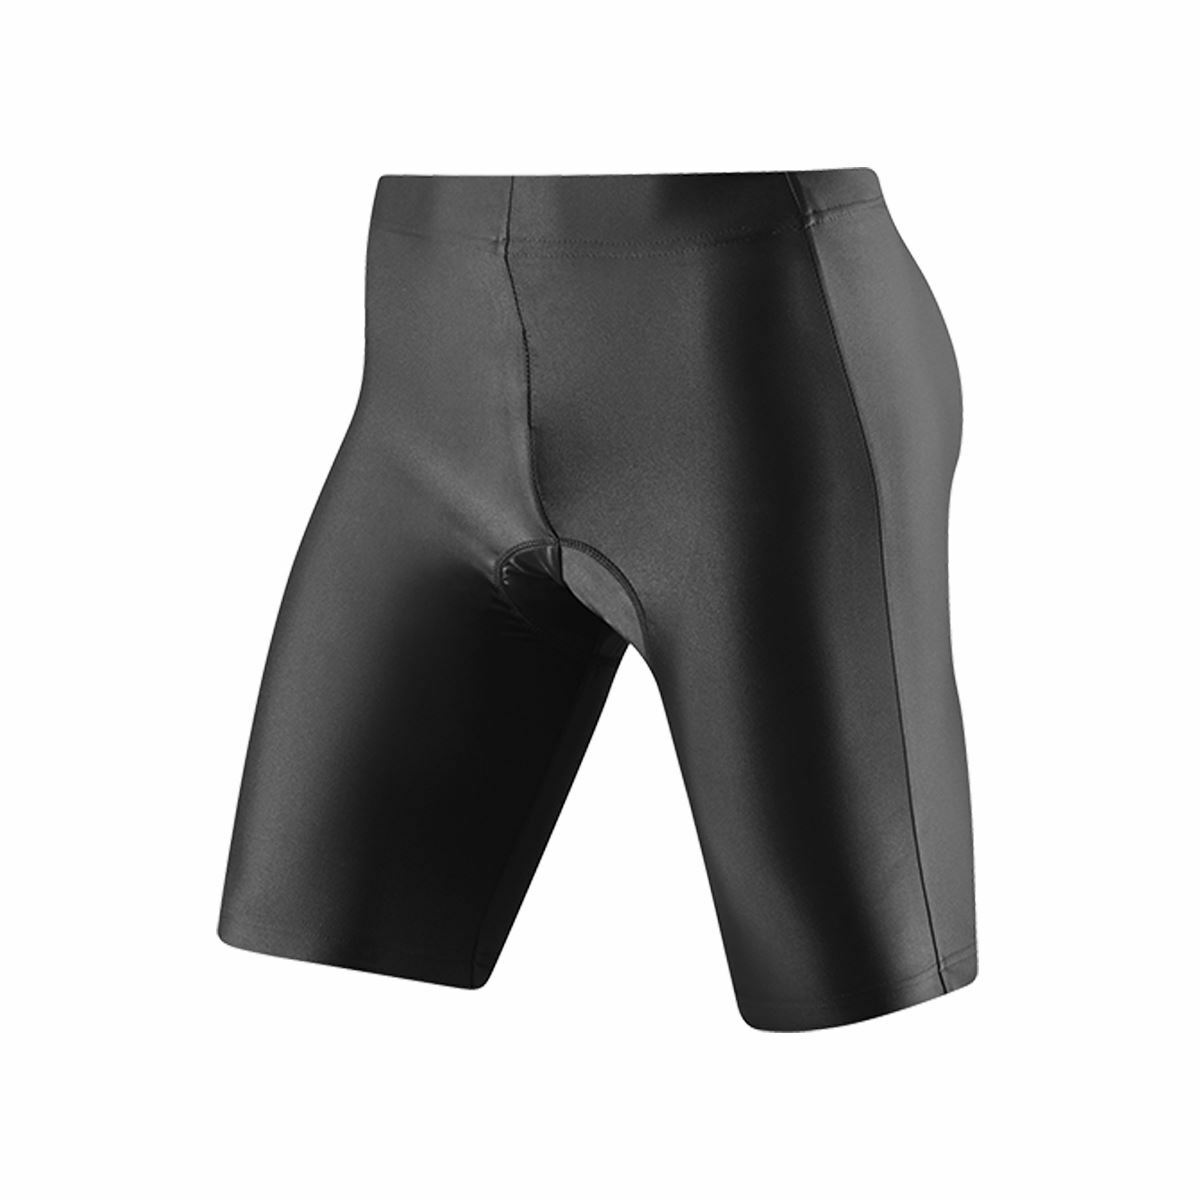 Altura Cadenza 2 Vita Pantaloncini da Ciclista Dualdensity High Visibilità Neri